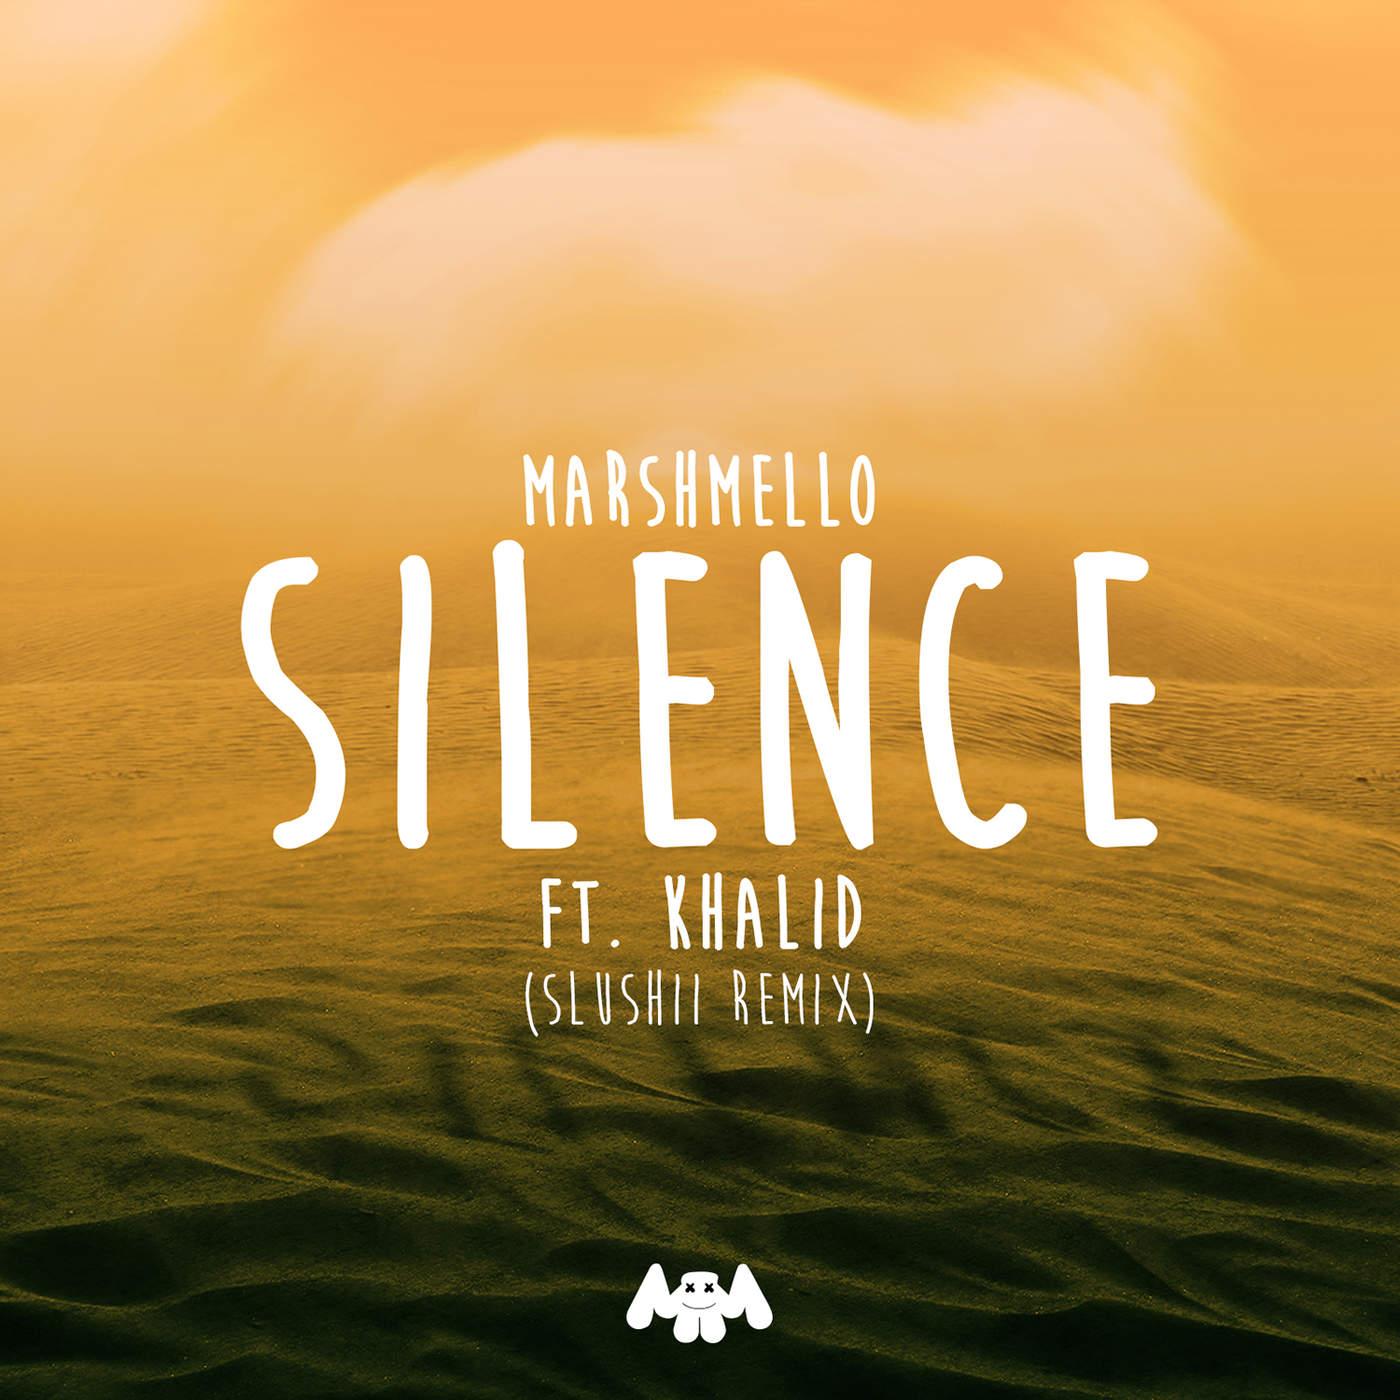 Marshmello & Svdden Death - Sell Out (Single) [iTunes Plus